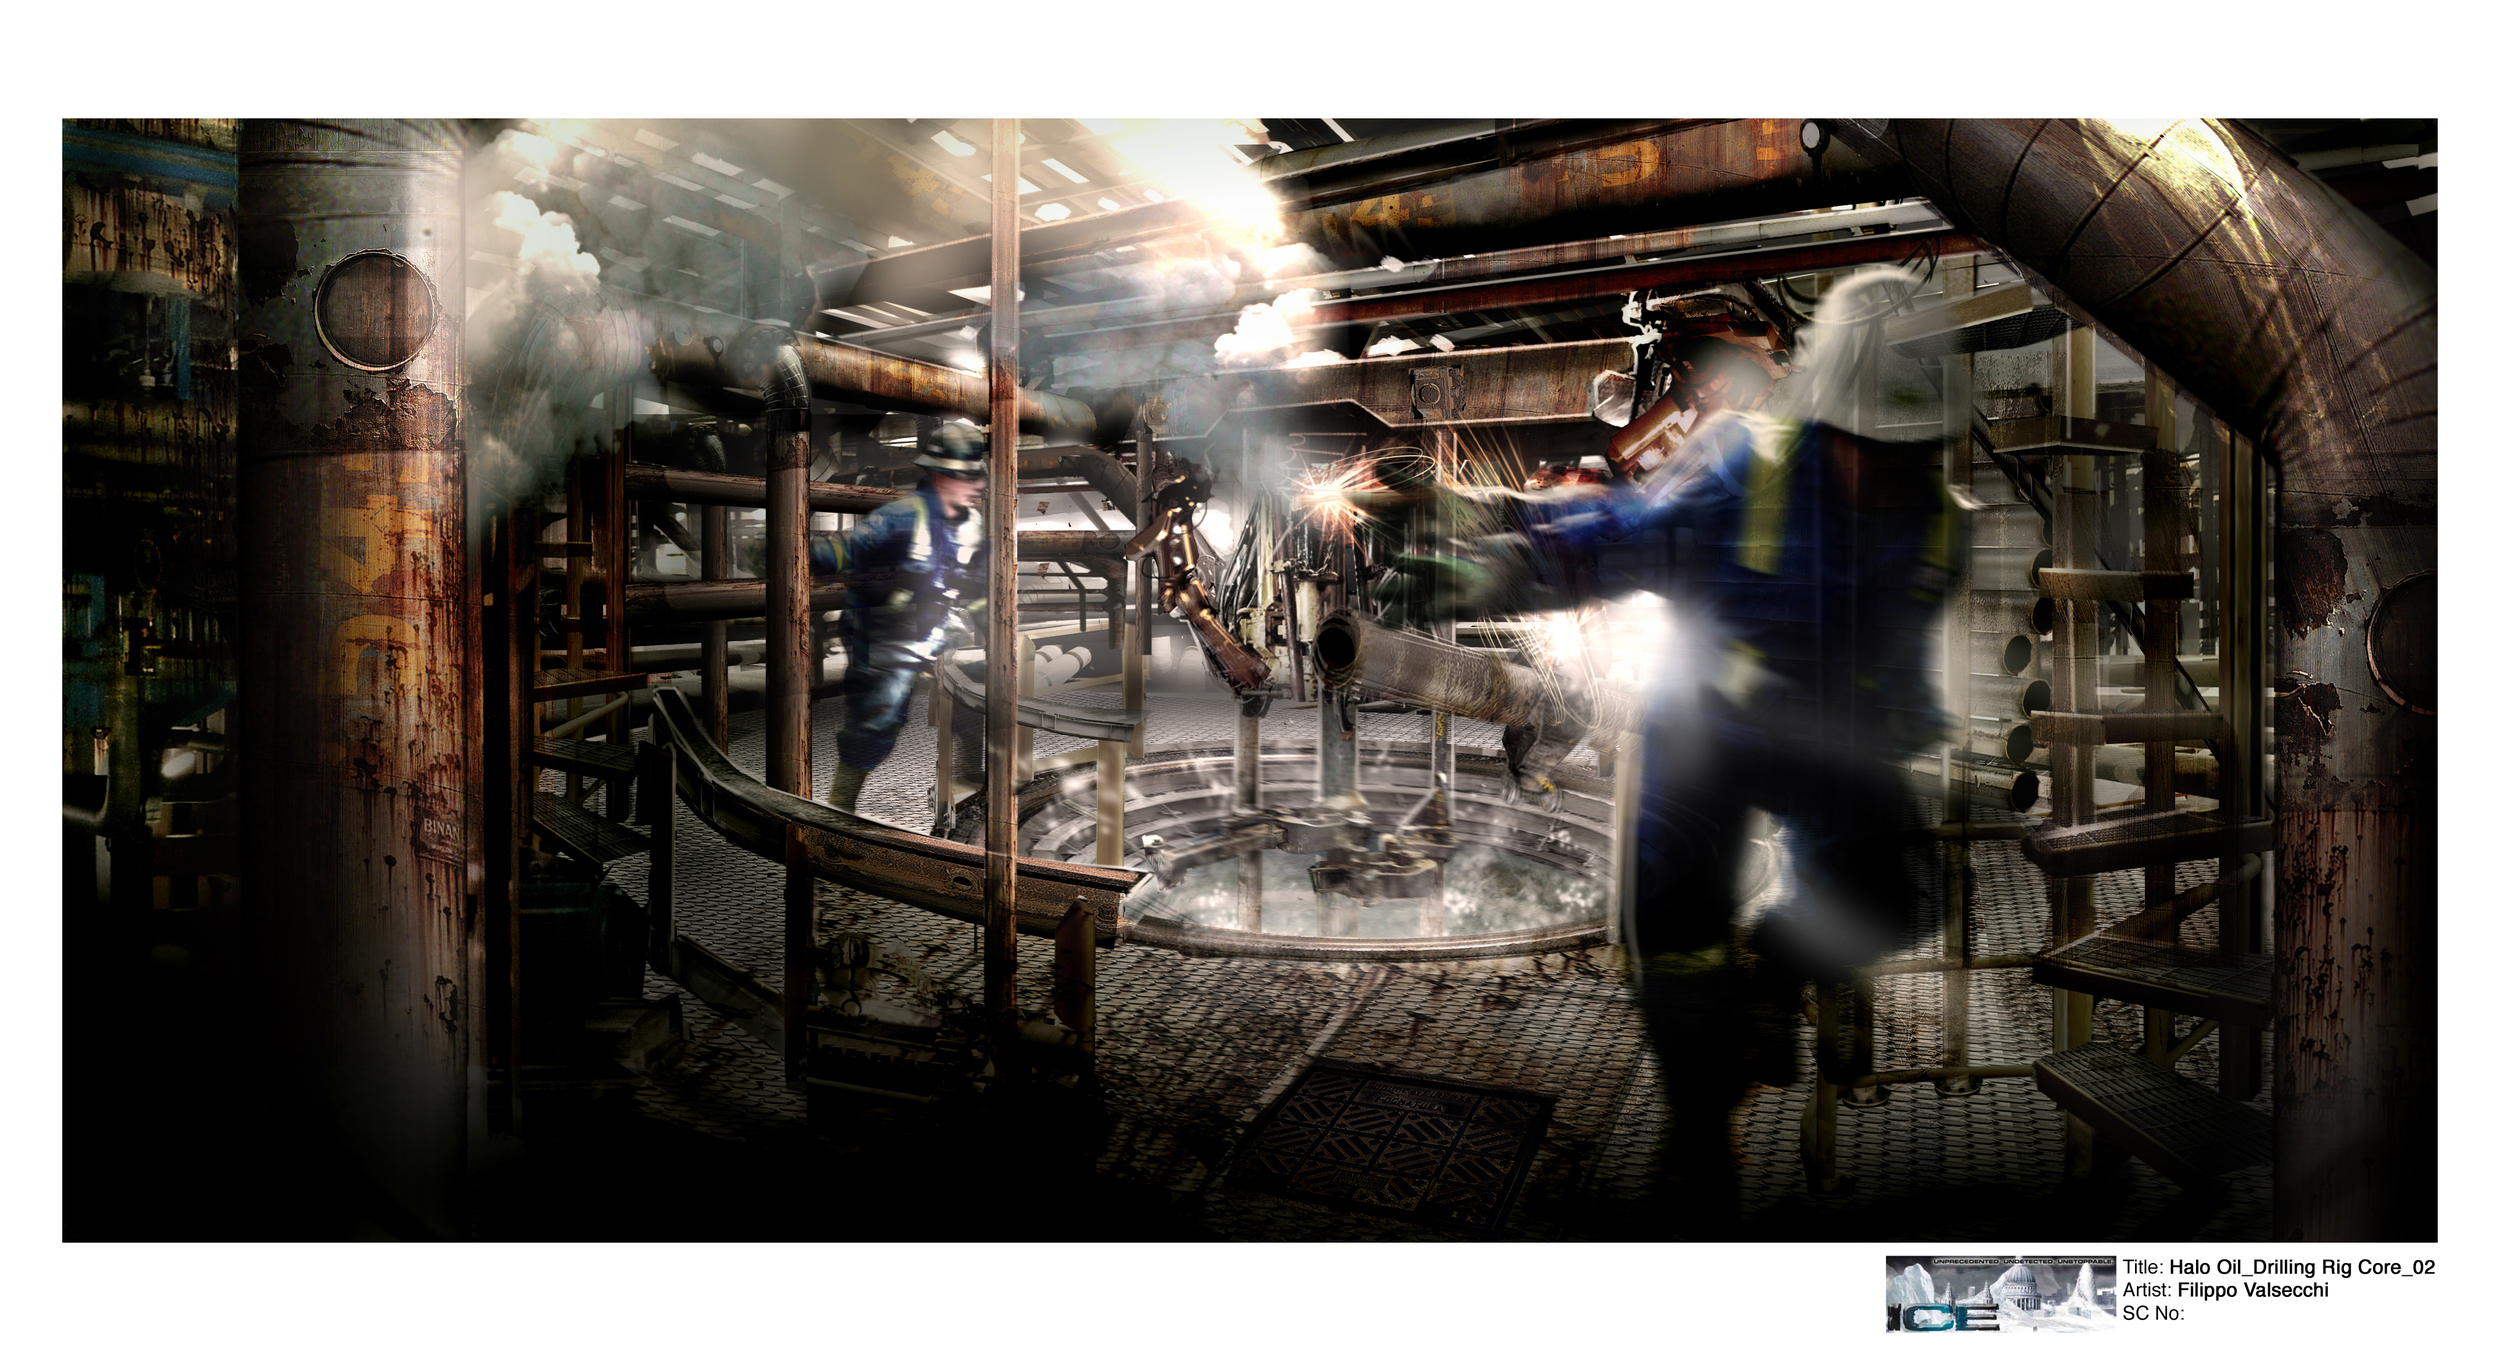 drilling_rig_col02.jpg